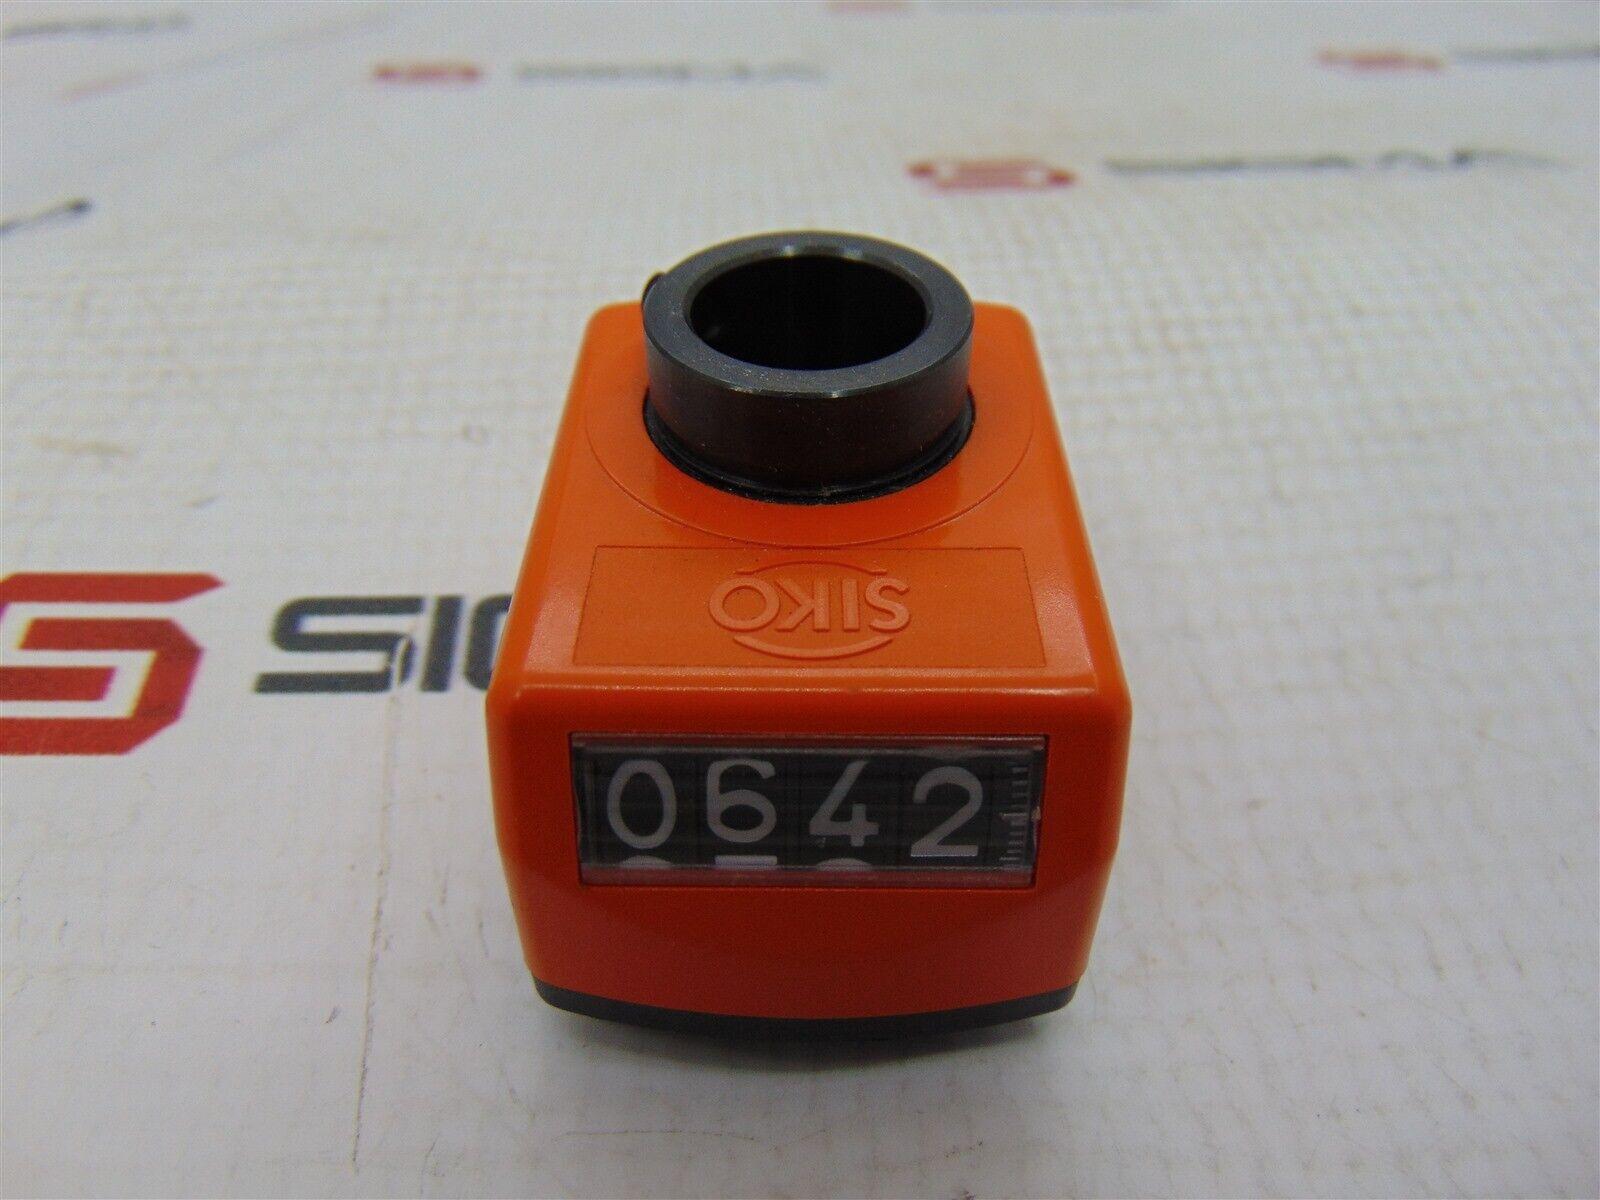 06-20-1-i Digital Position Indicator 14mm Siko DA04-0069